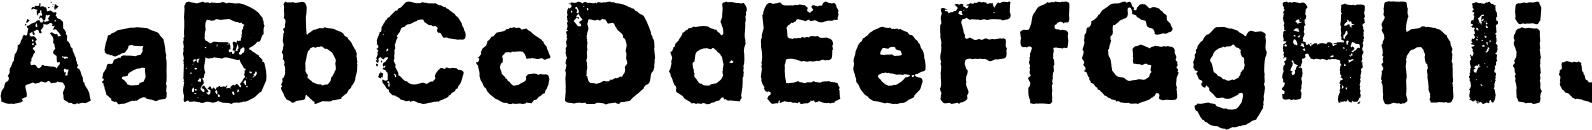 Sztempel